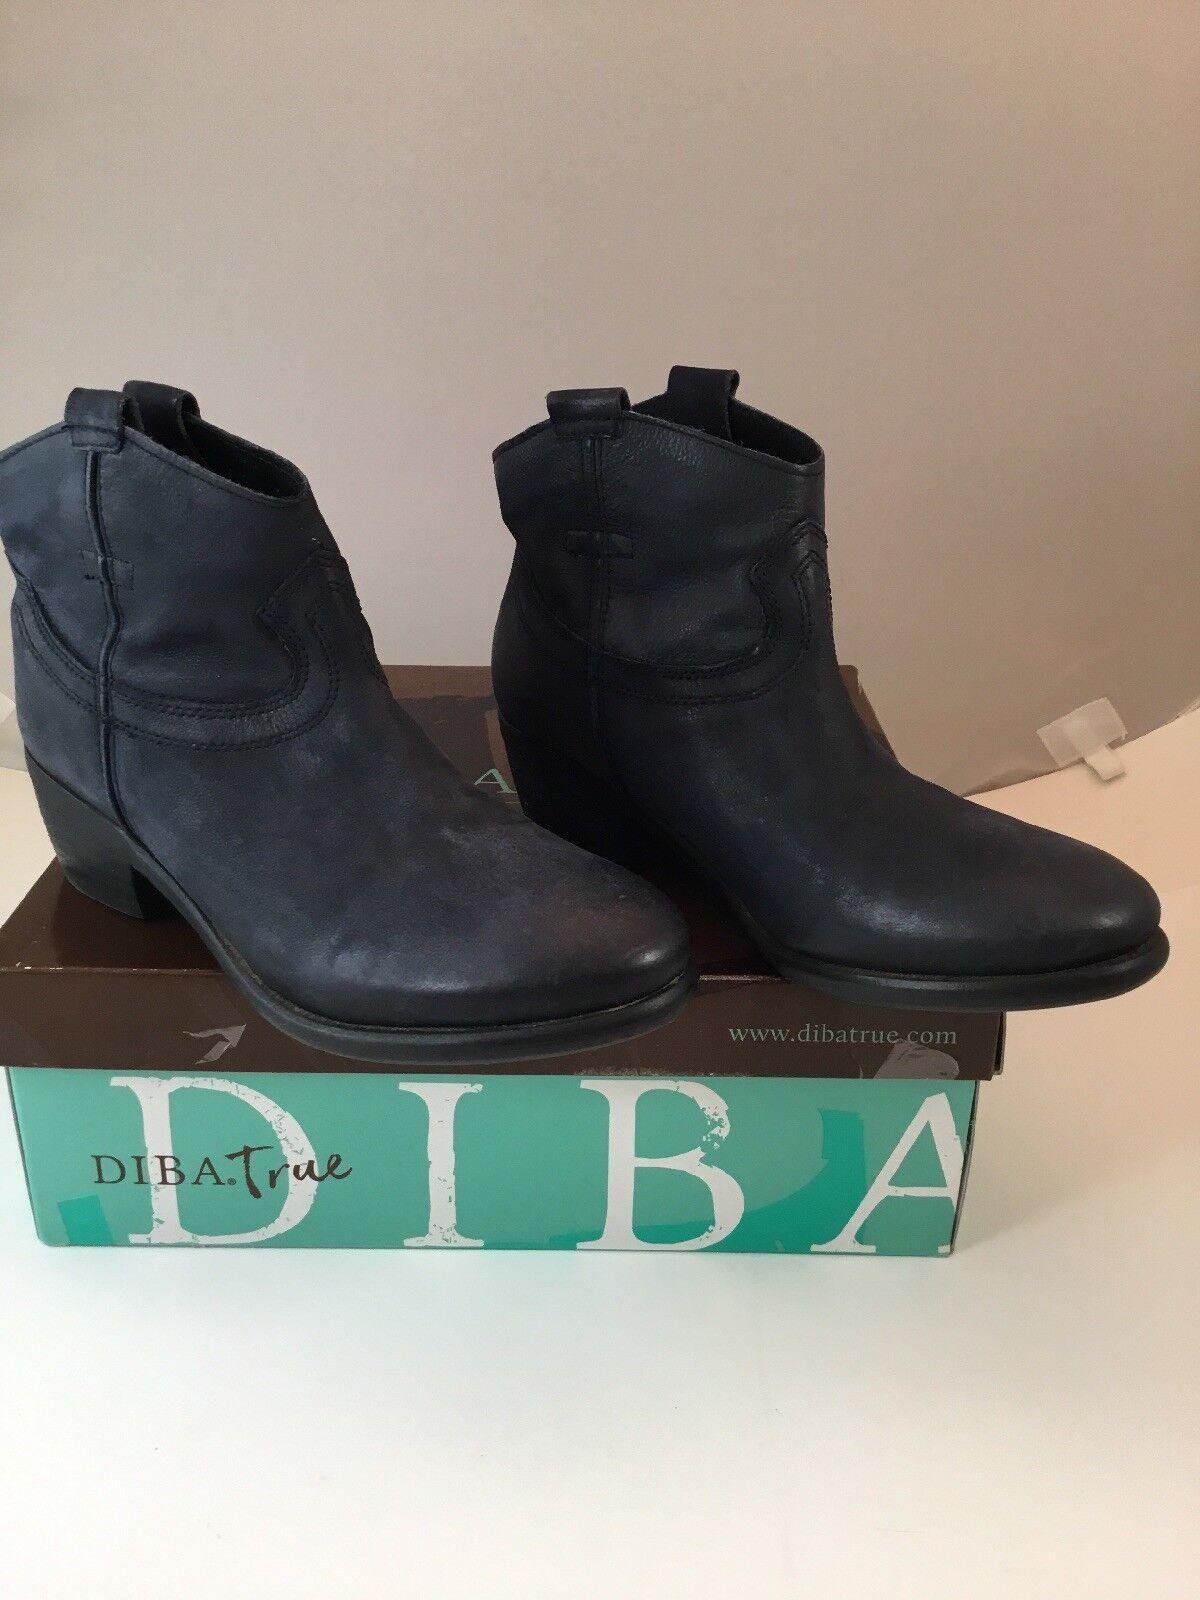 DIBA True 34210 Moon River Grey Leather NiB Women's 7.5 Ankle Boot